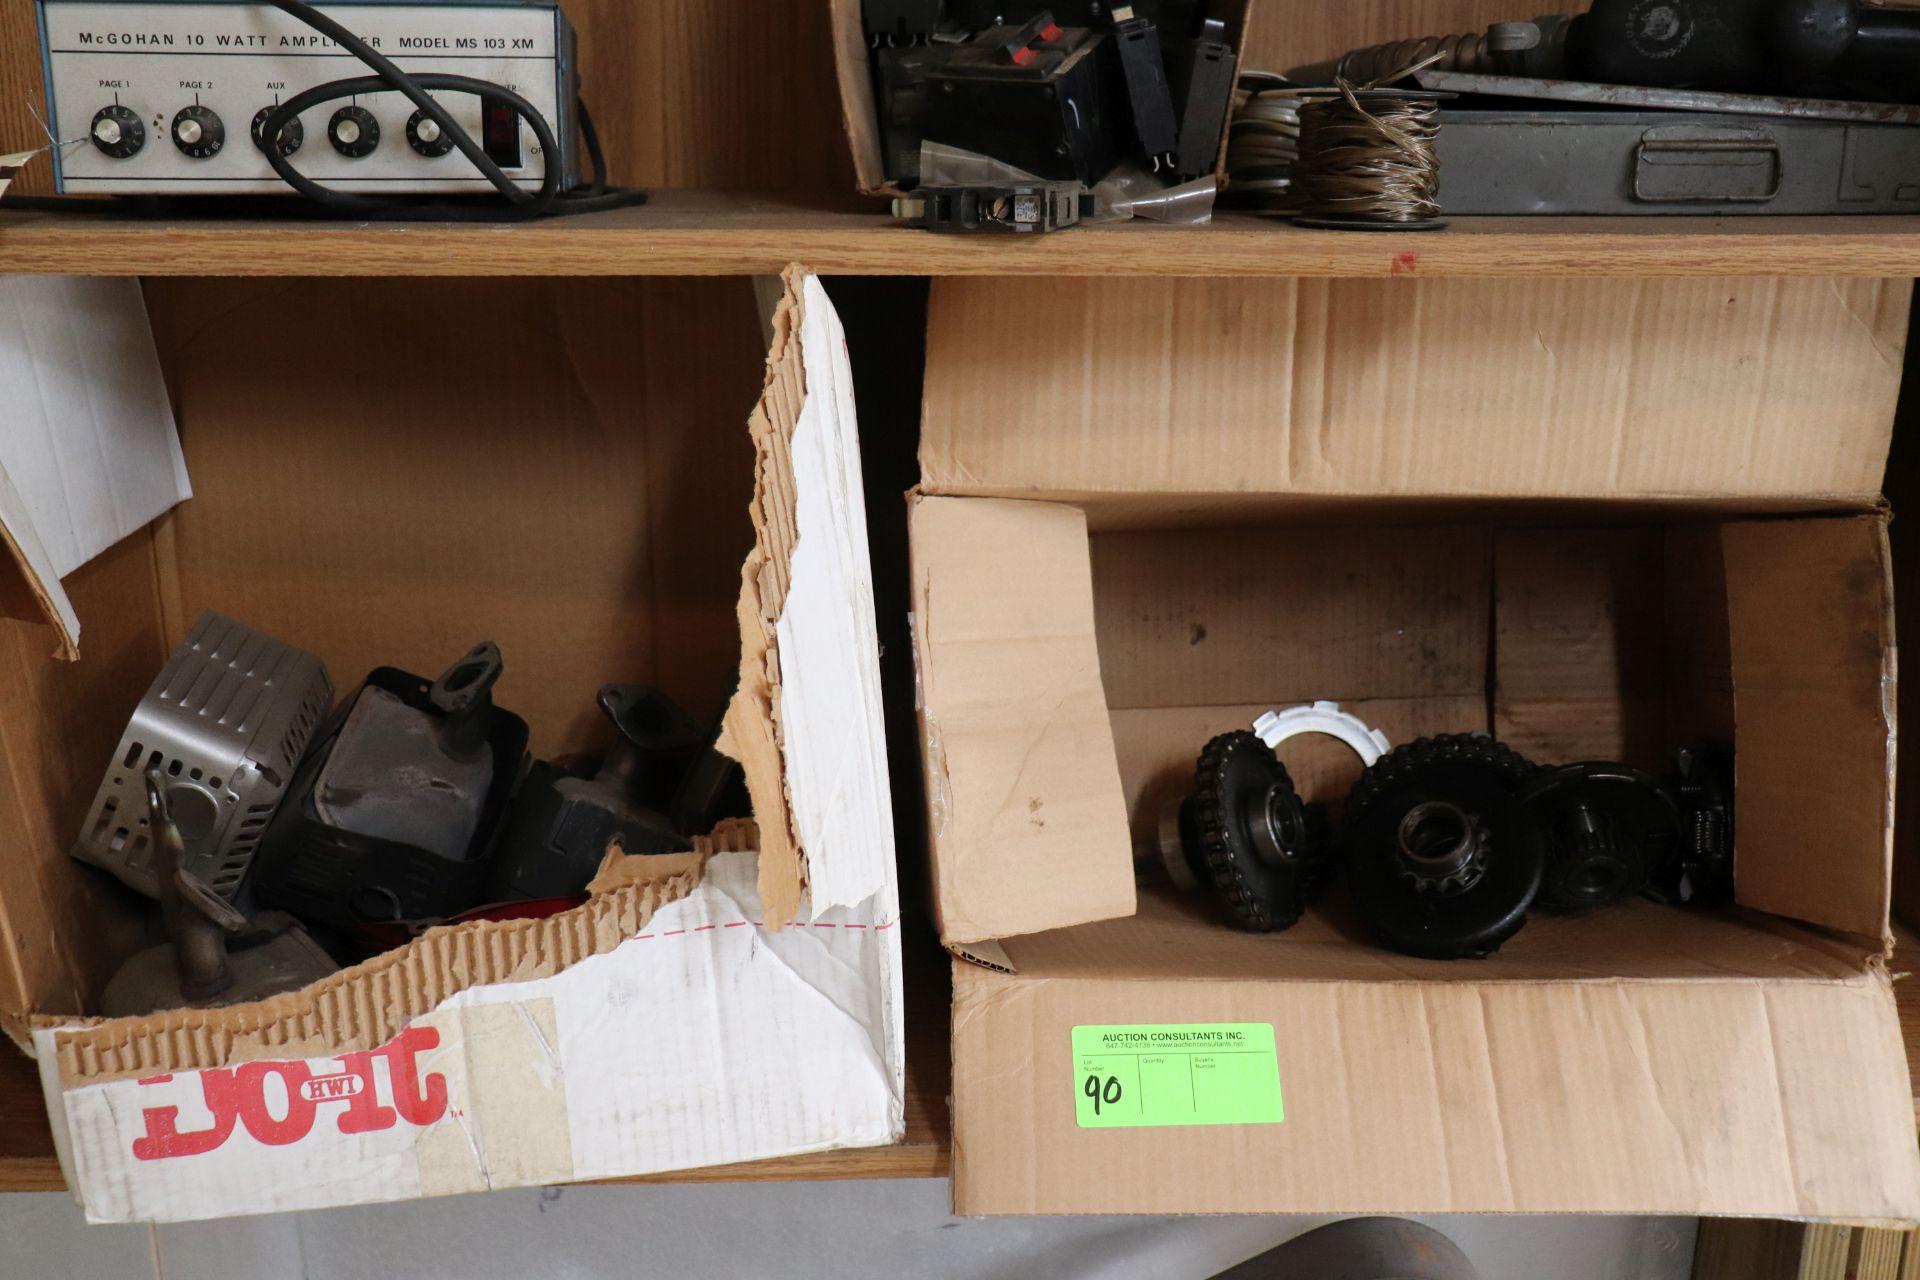 Go-kart muffler and transmission parts